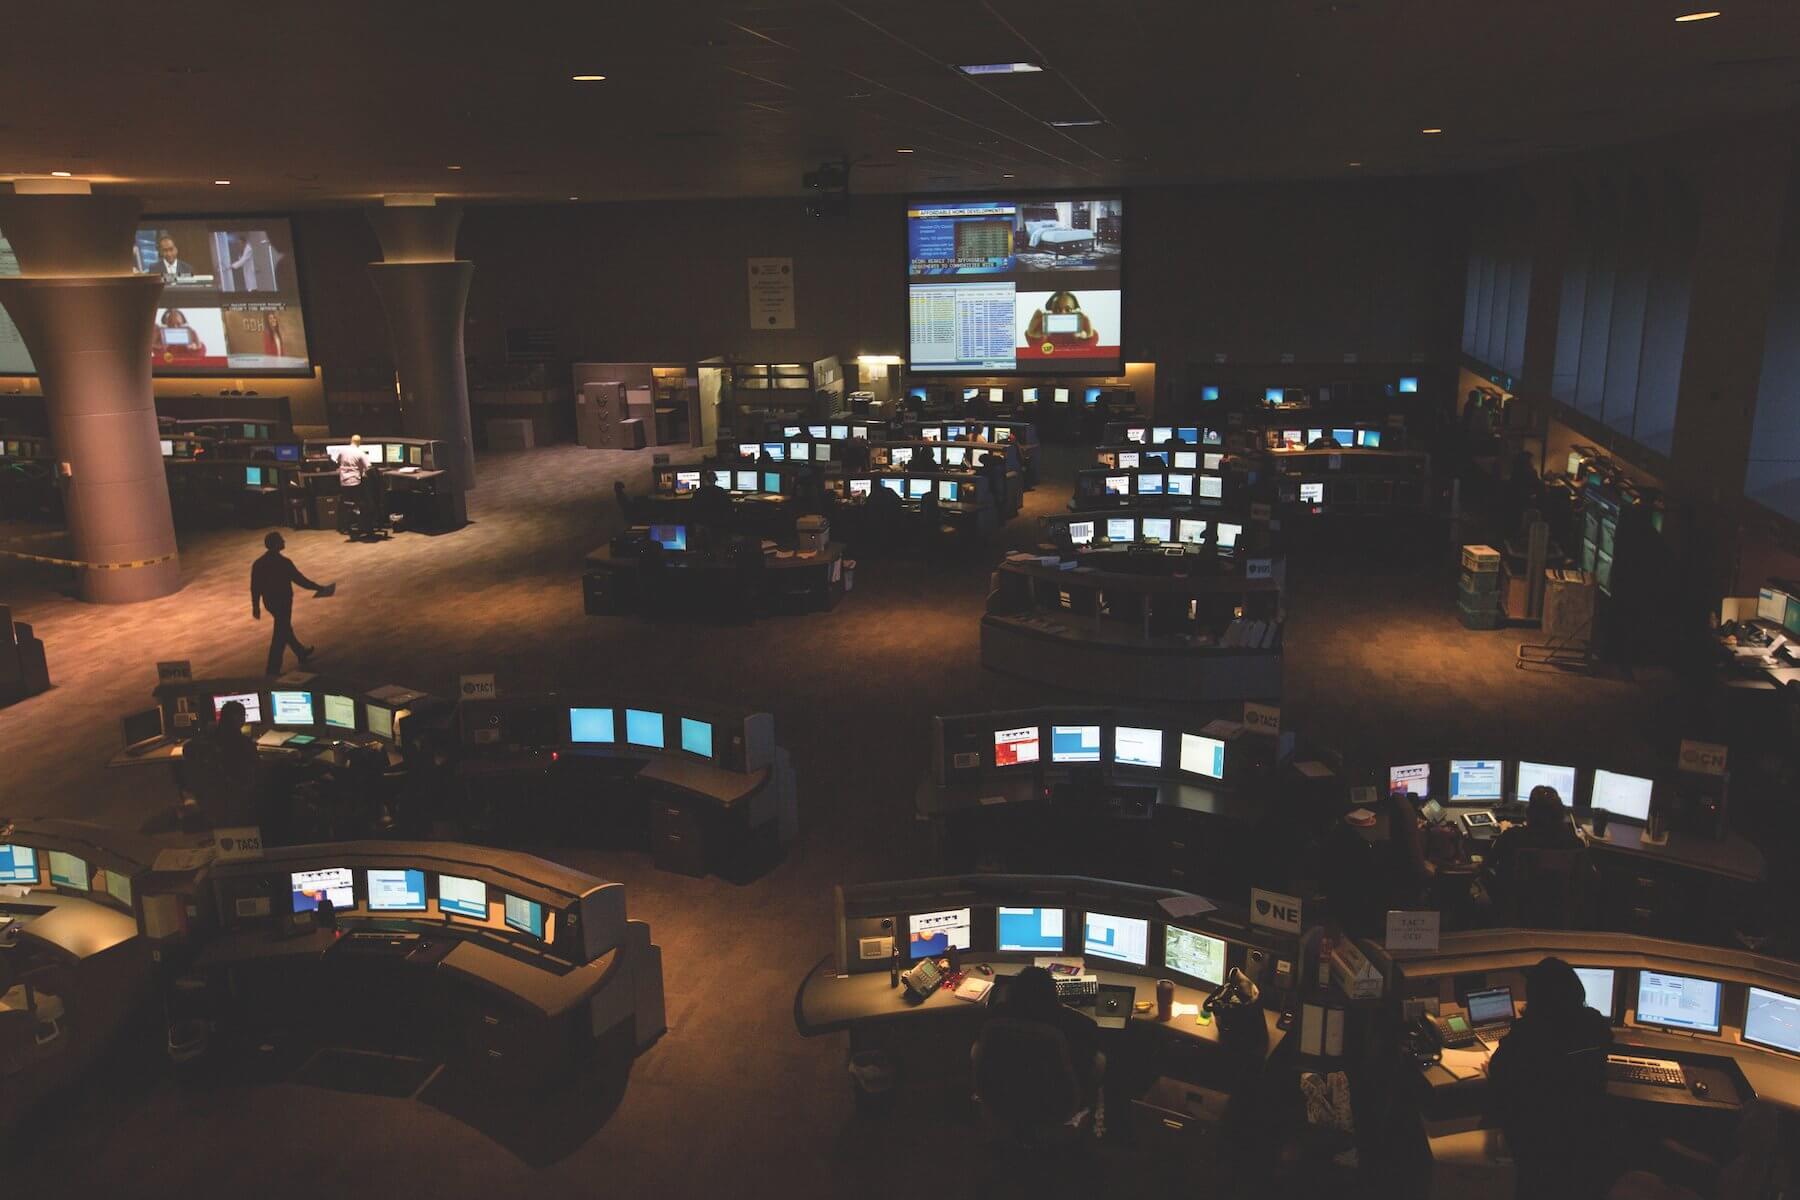 The Houston Emergency Center handles 9,000 calls per day.